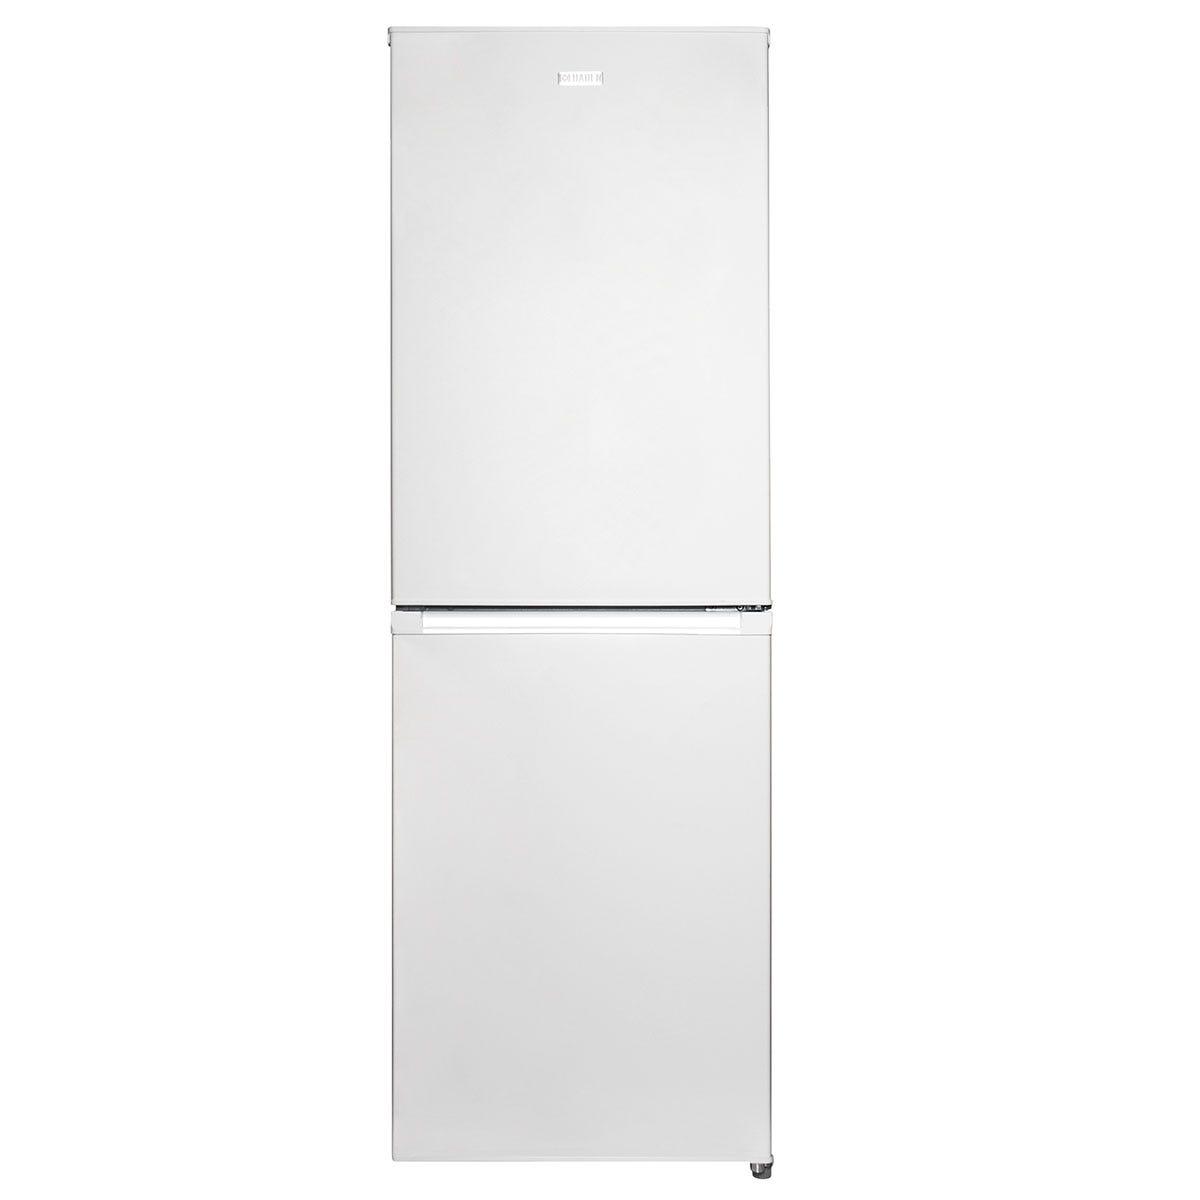 Haden HFF152W 50cm Frost Free 50:50 Fridge Freezer - White